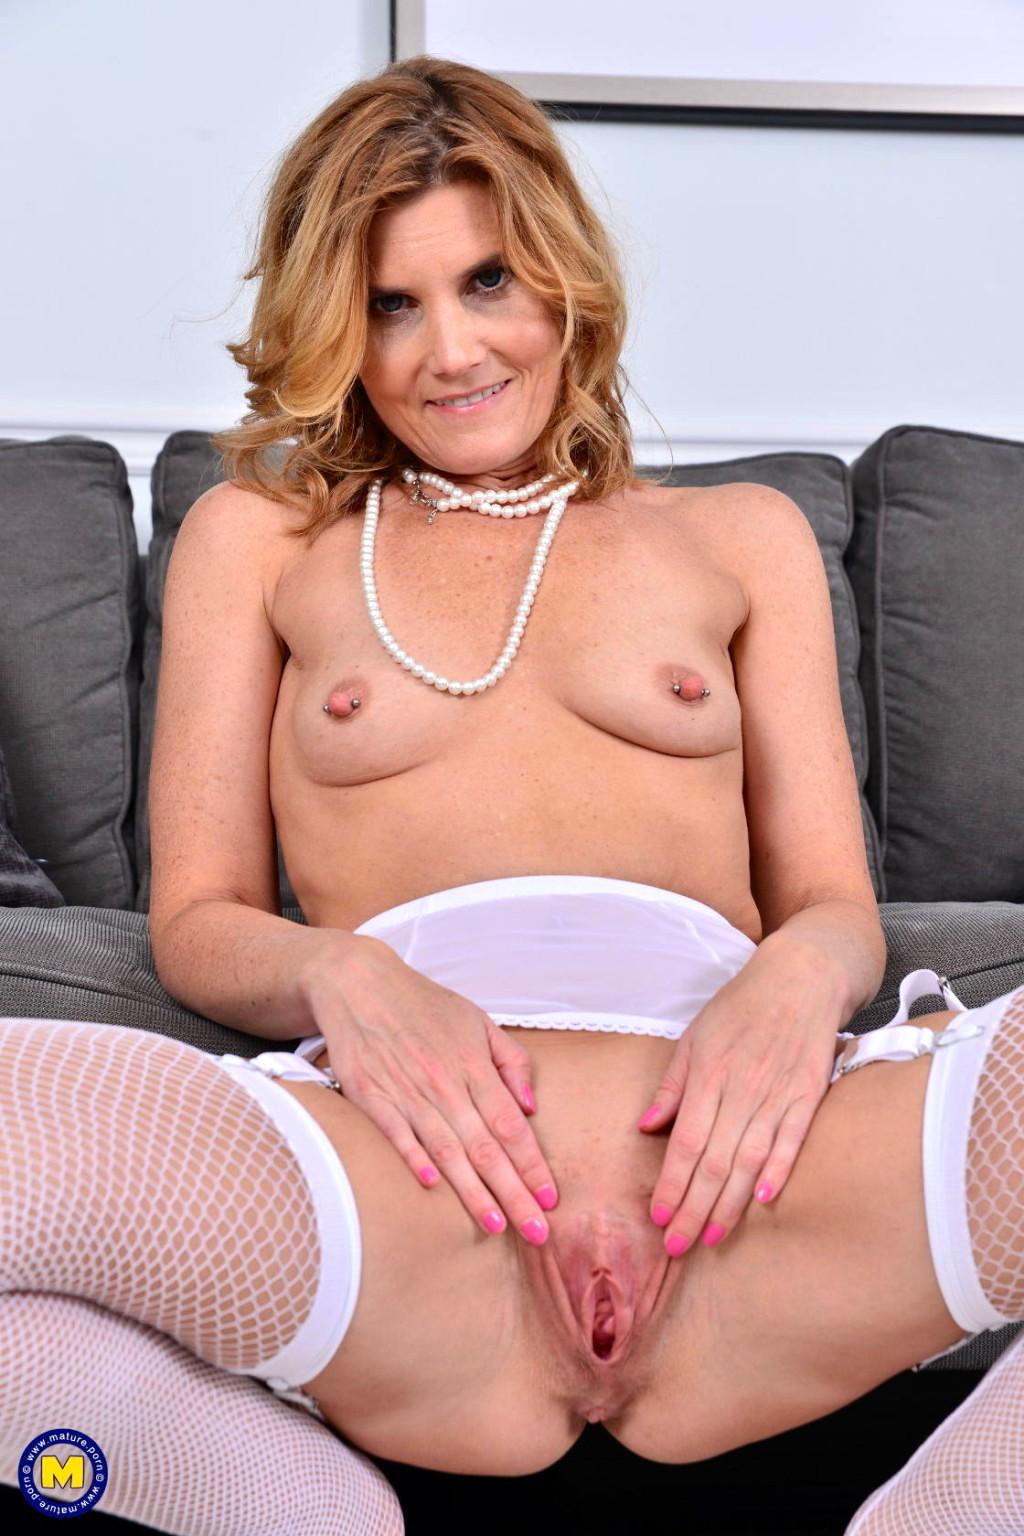 Mature Nl Alby Daor Sensual Blonde Saxe Sex Hd Pics-9085